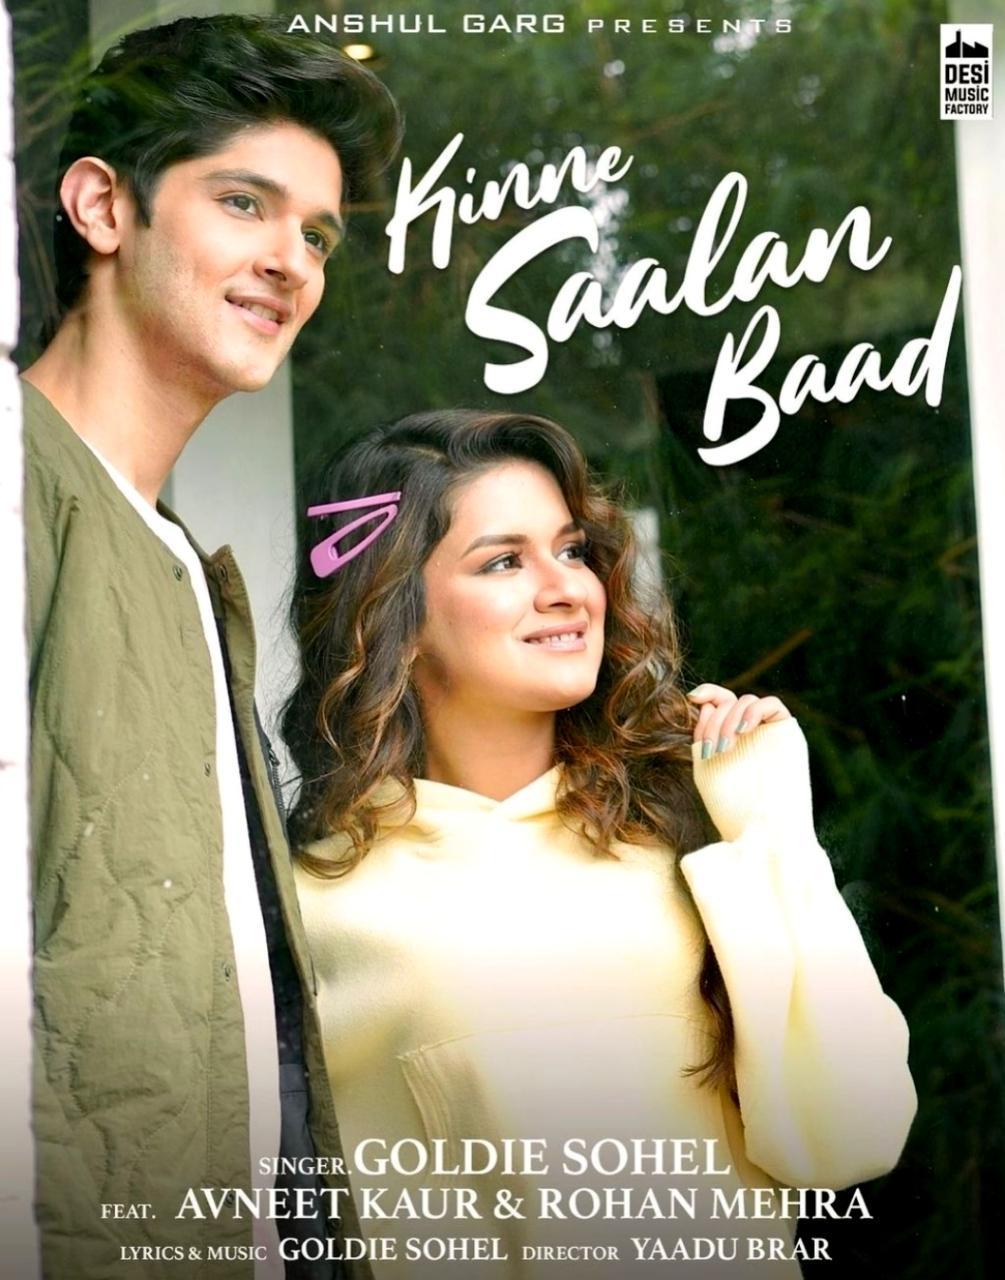 Kinne Saalan Baad Punjabi Song Lyrics, Sung By Goldie Sohel